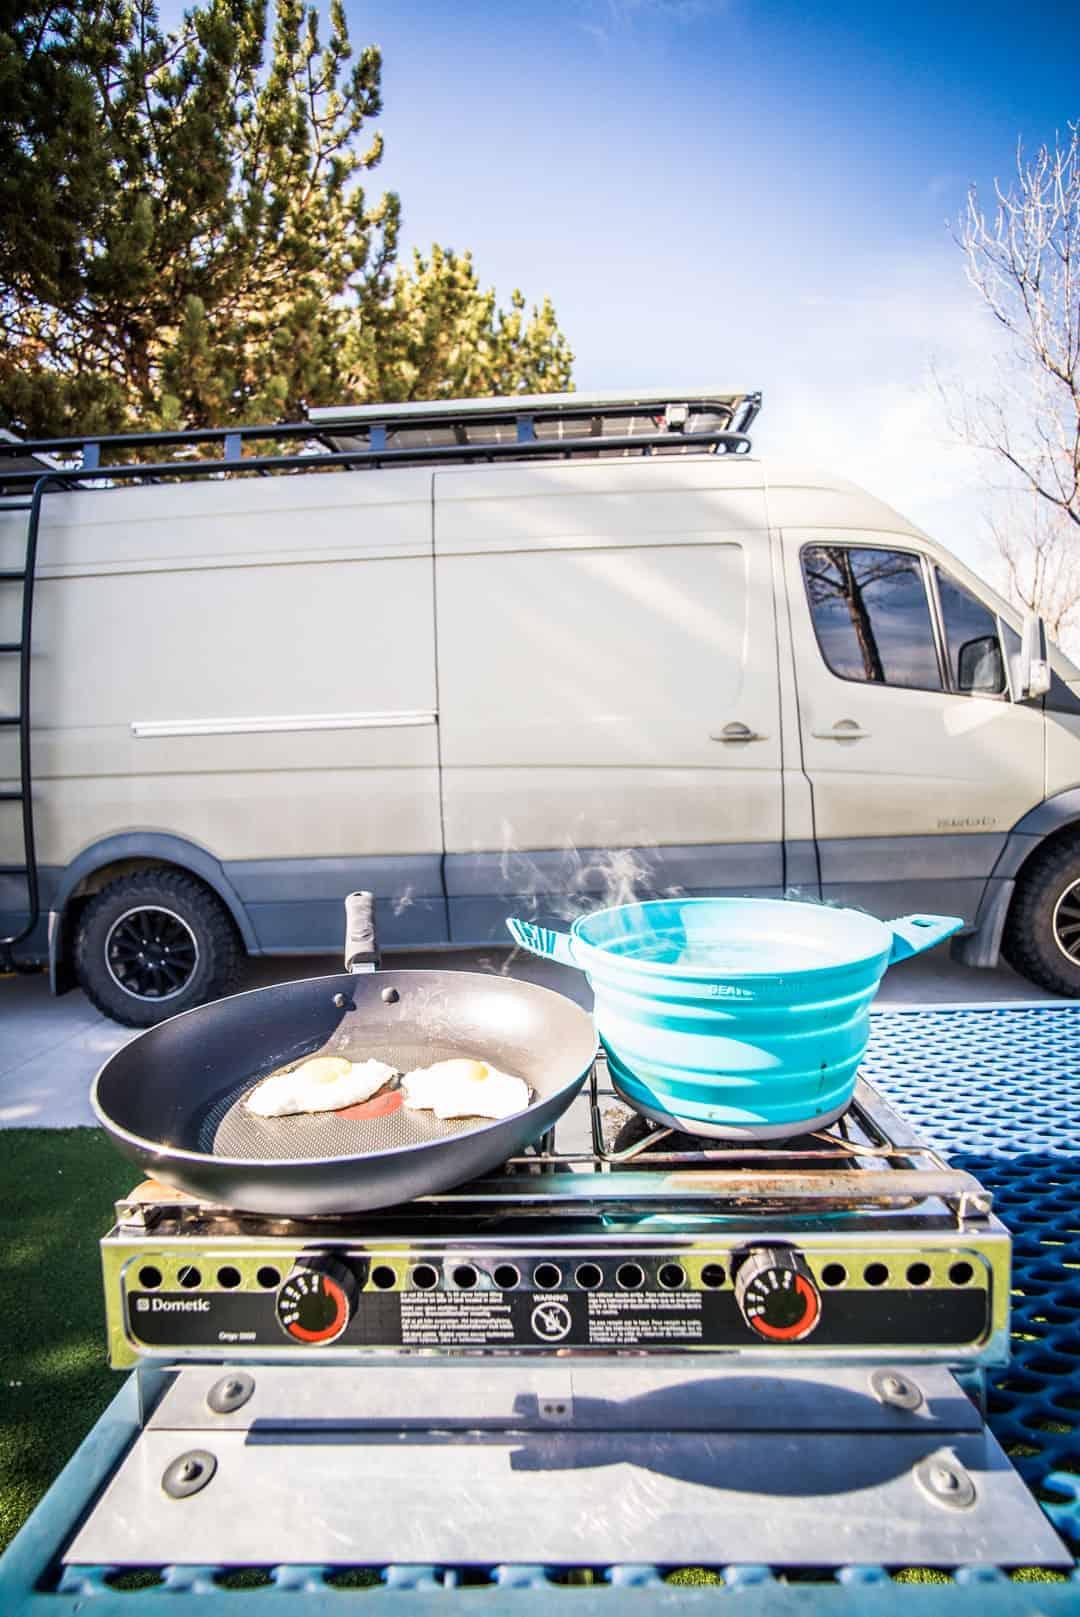 Portable Camp Stove Review - Dometic Origo 3000 Camper Van Alcohol Stove-4